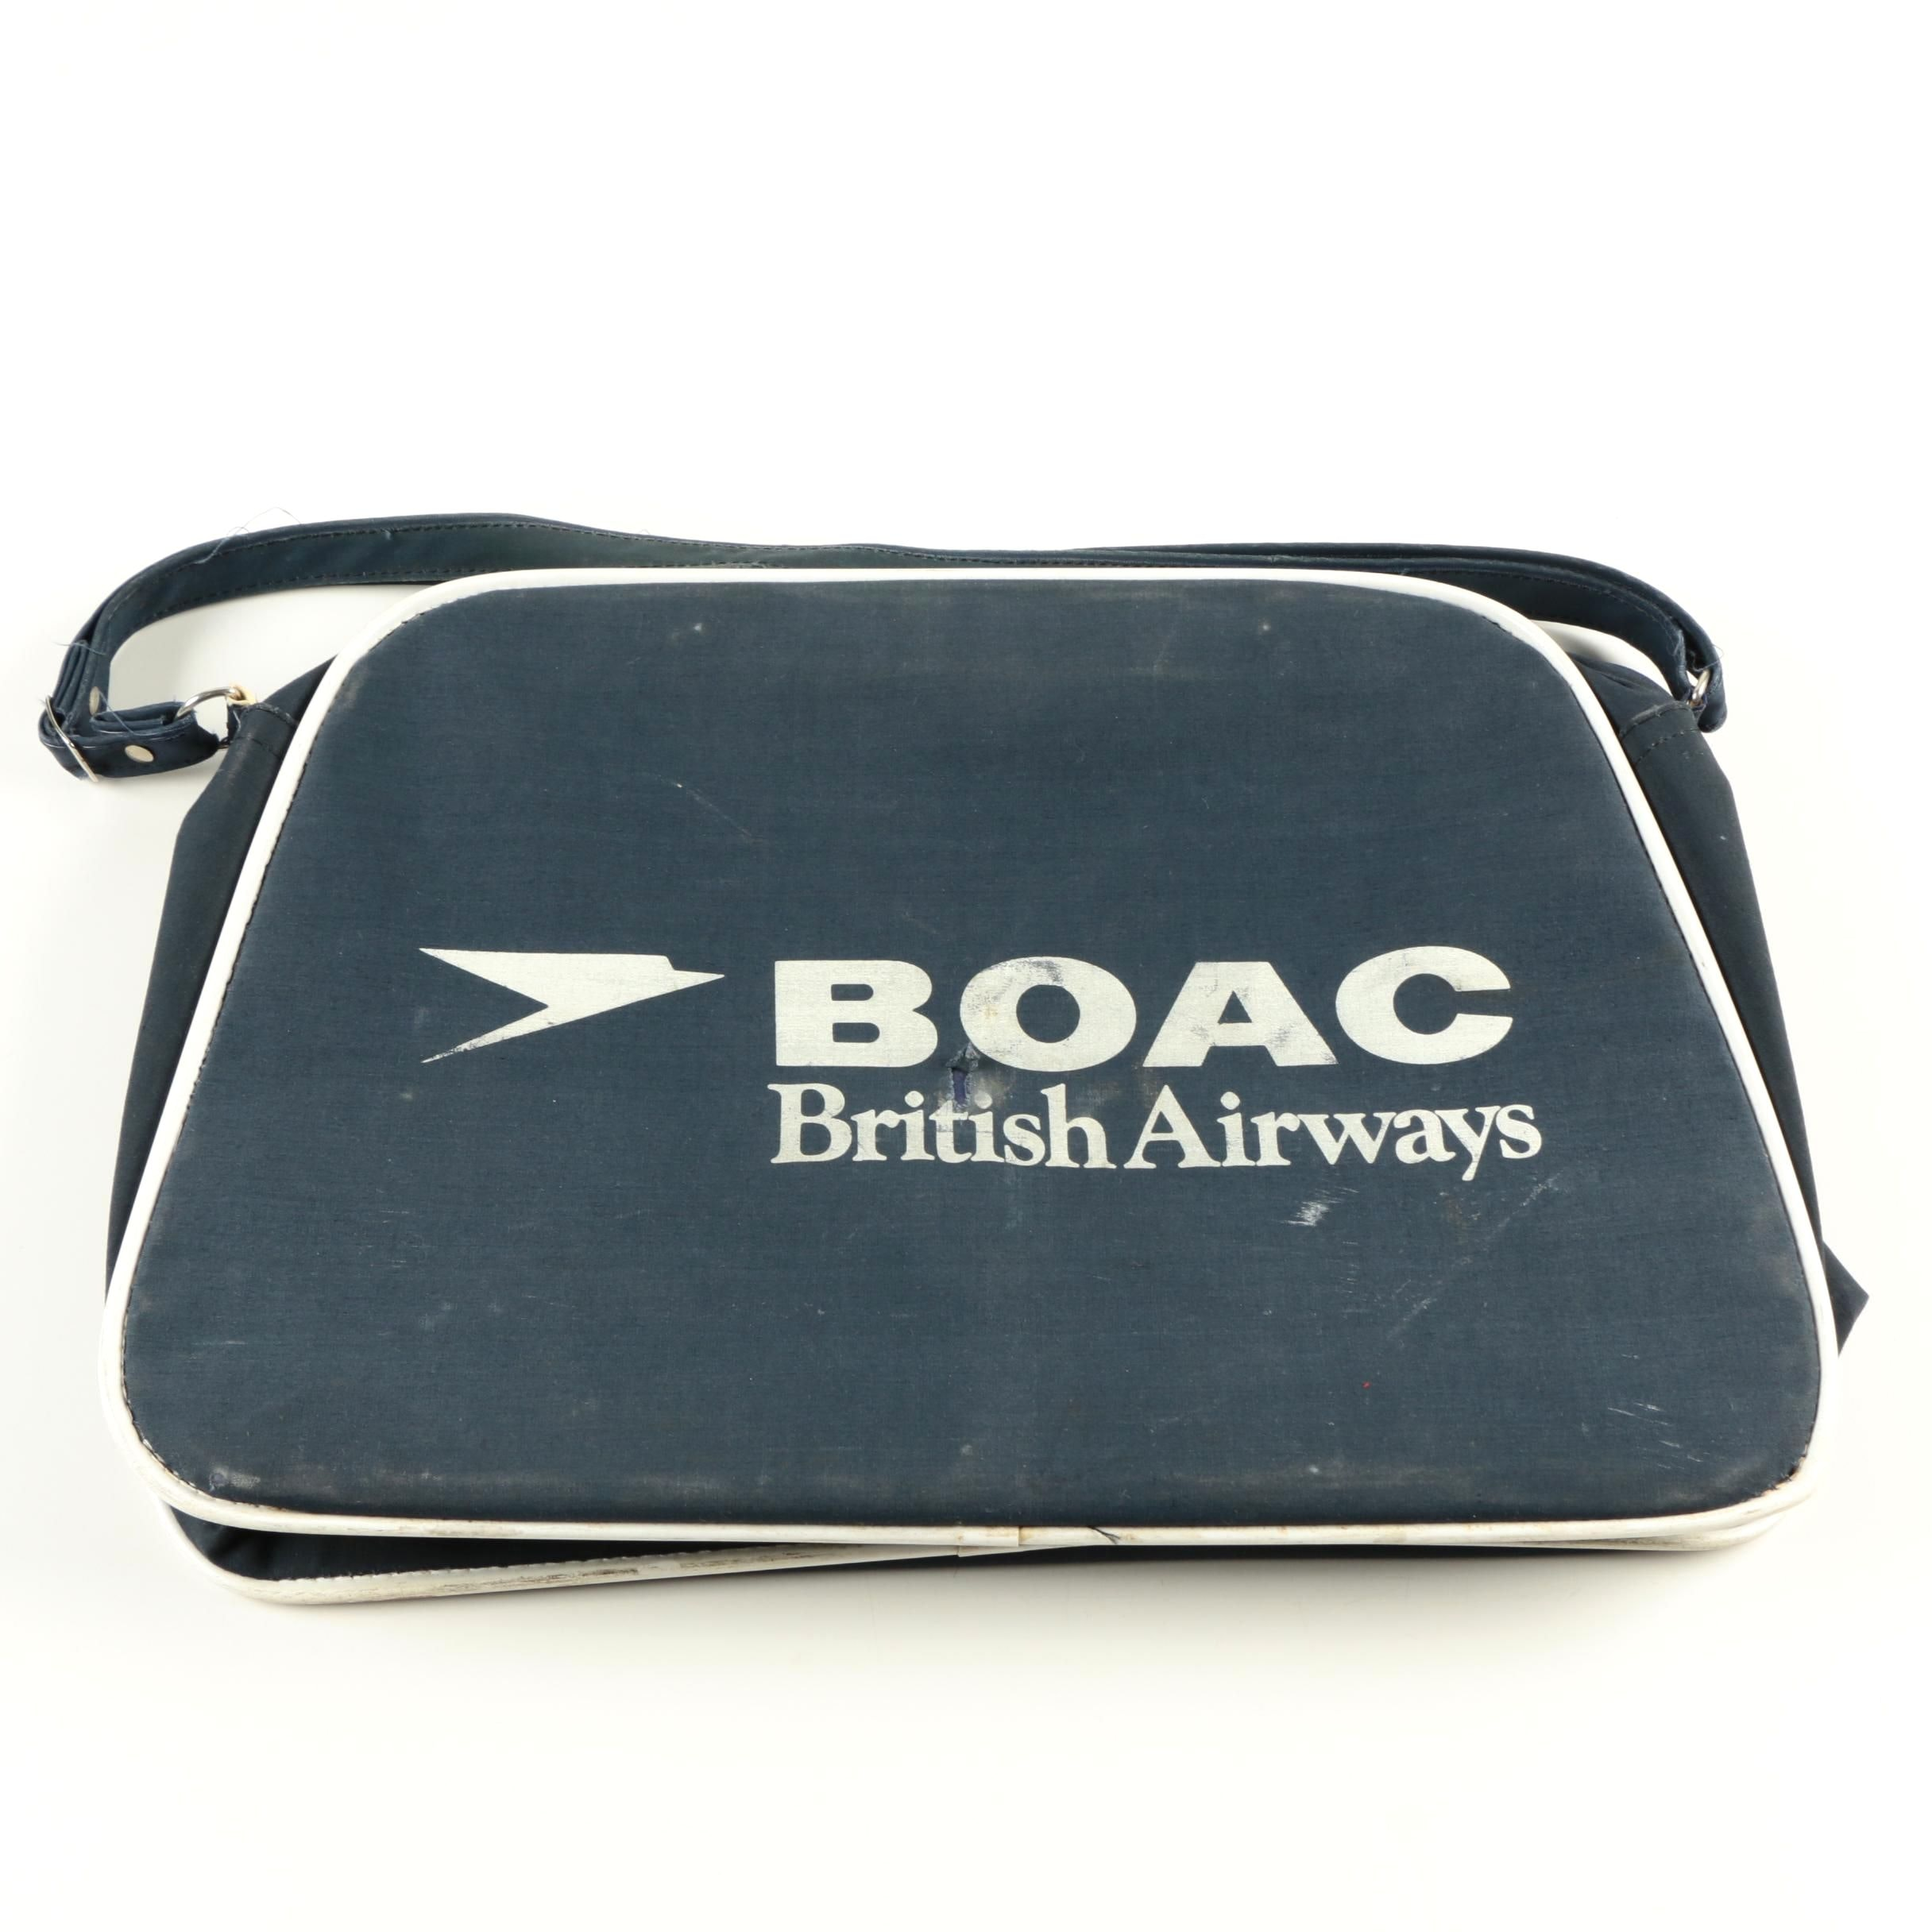 Vintage Boac British Airways Travel Bag